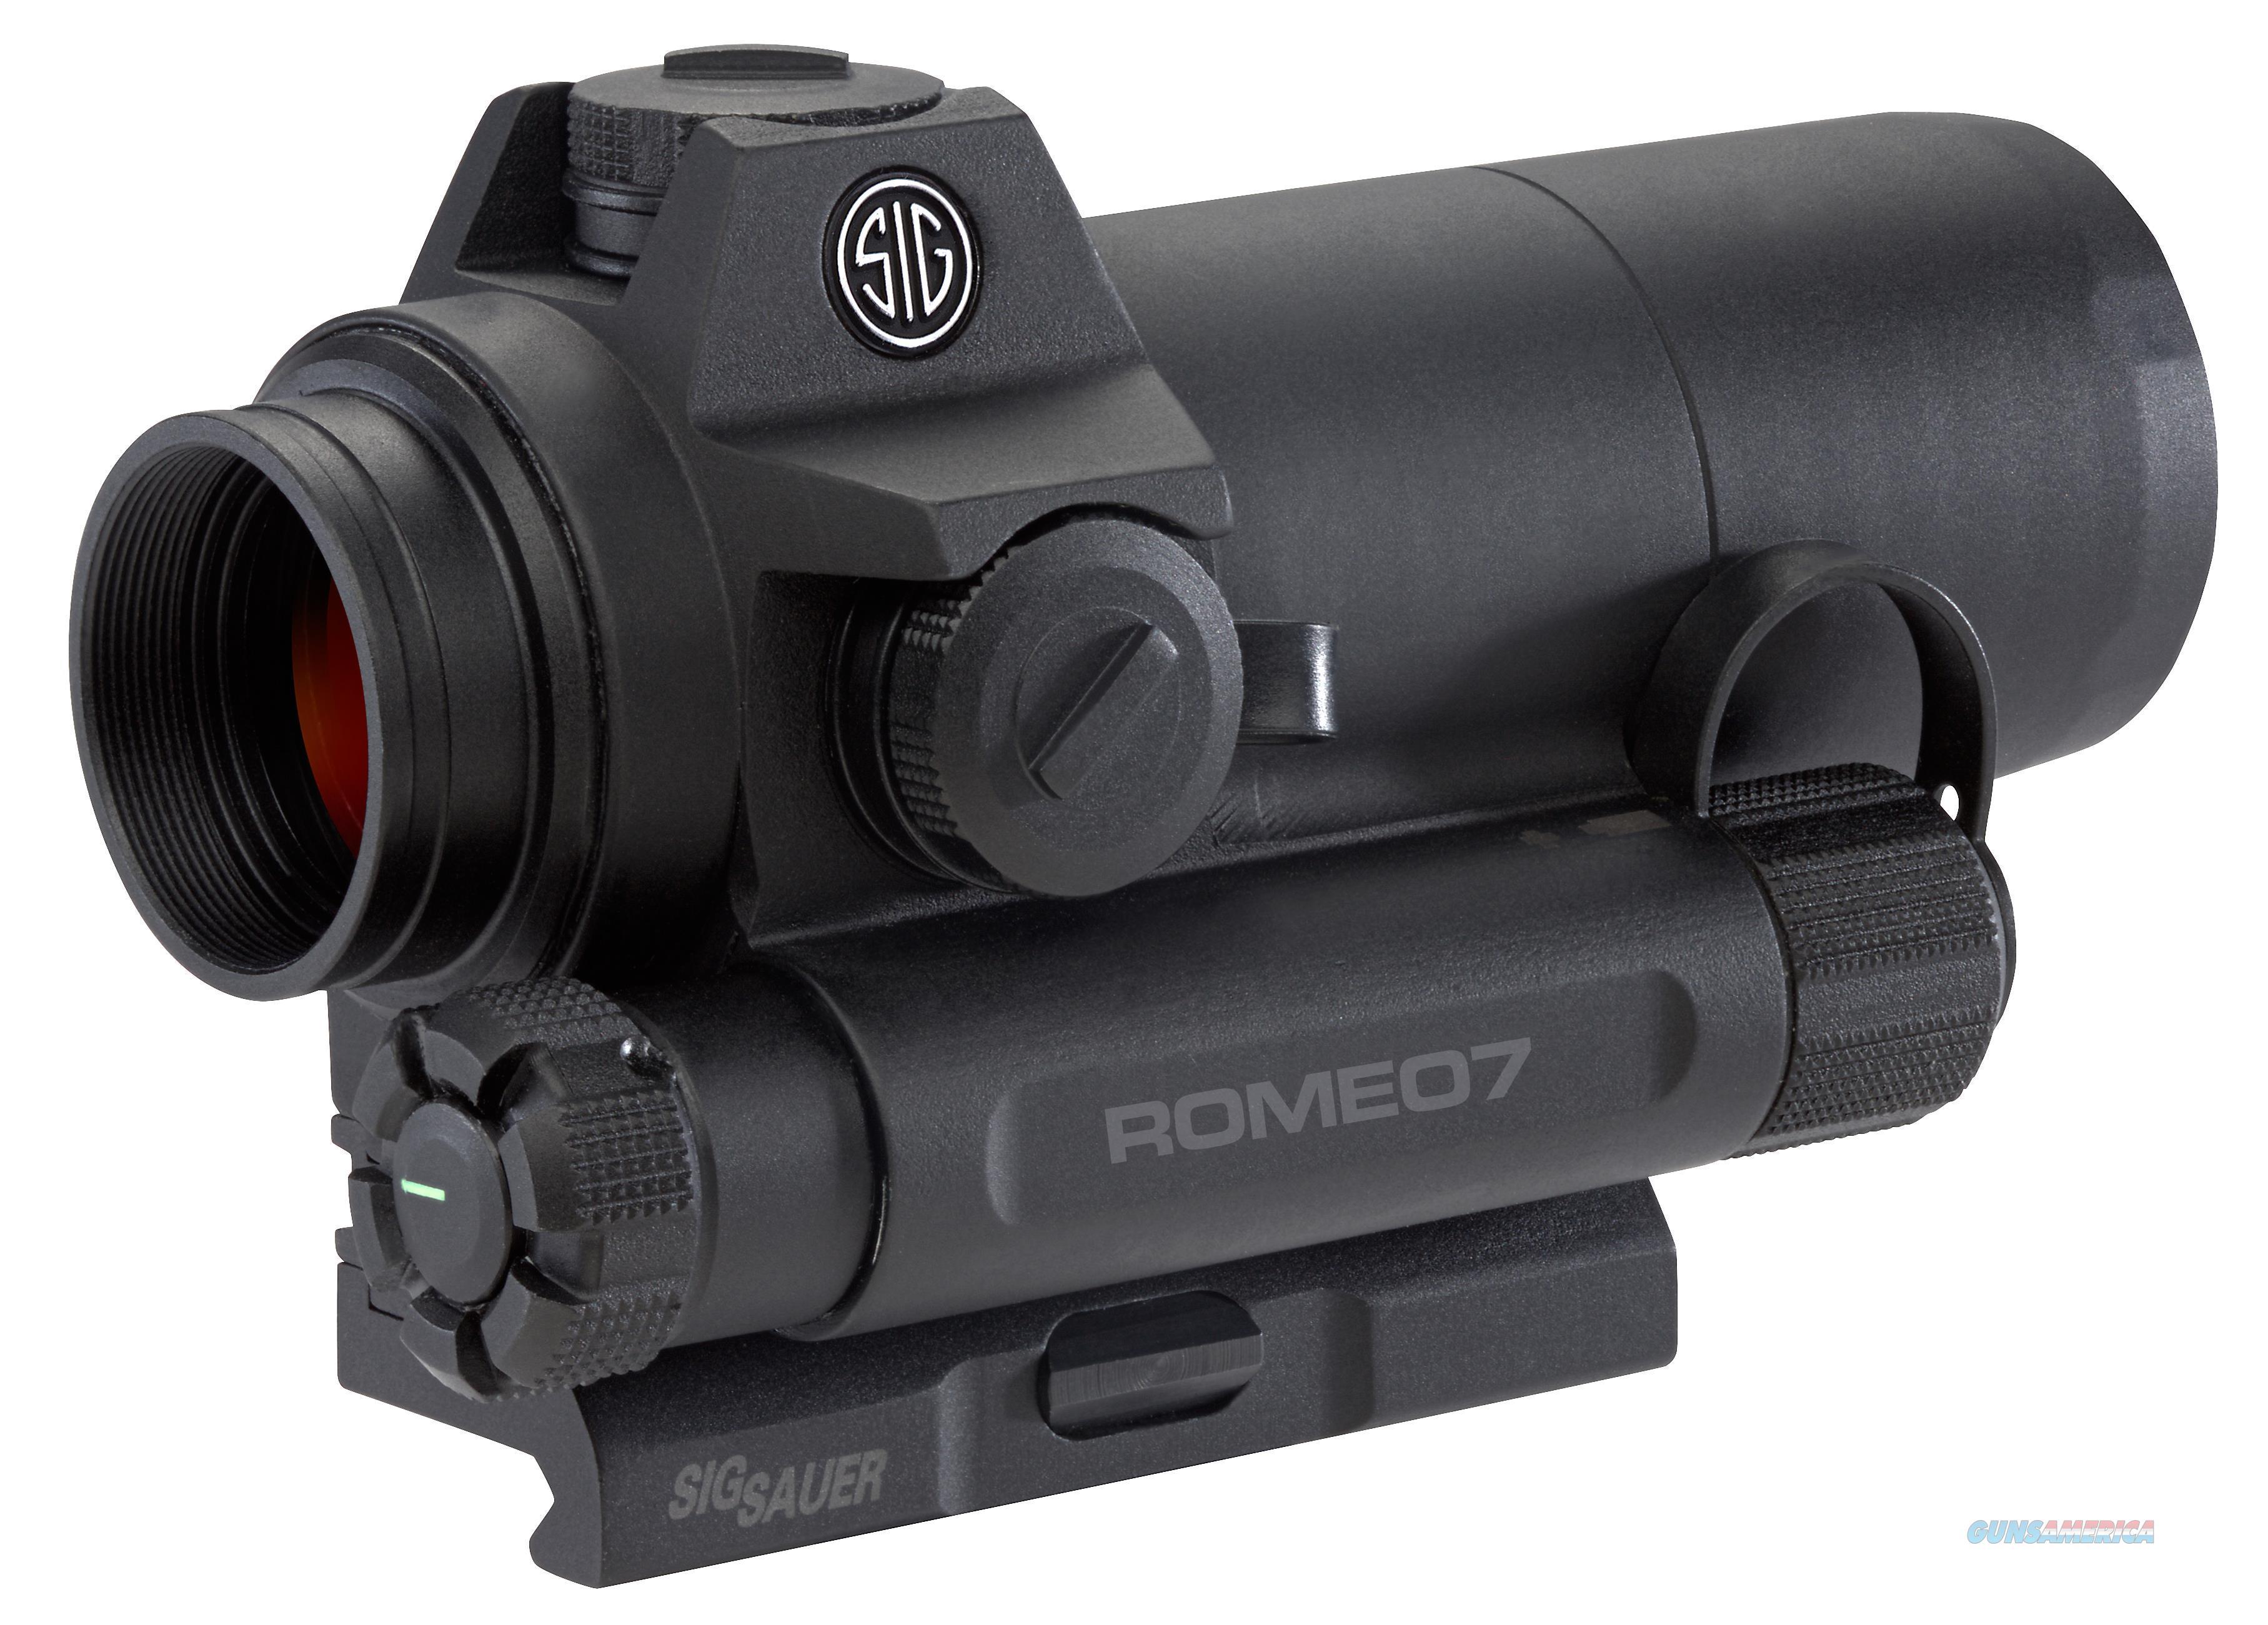 Sig Sauer Electro-Optics Sor71001 Romeo7 1X 30Mm Obj 2 Moa Illuminated Red Dot Black Aa SOR71001  Non-Guns > Scopes/Mounts/Rings & Optics > Rifle Scopes > Variable Focal Length